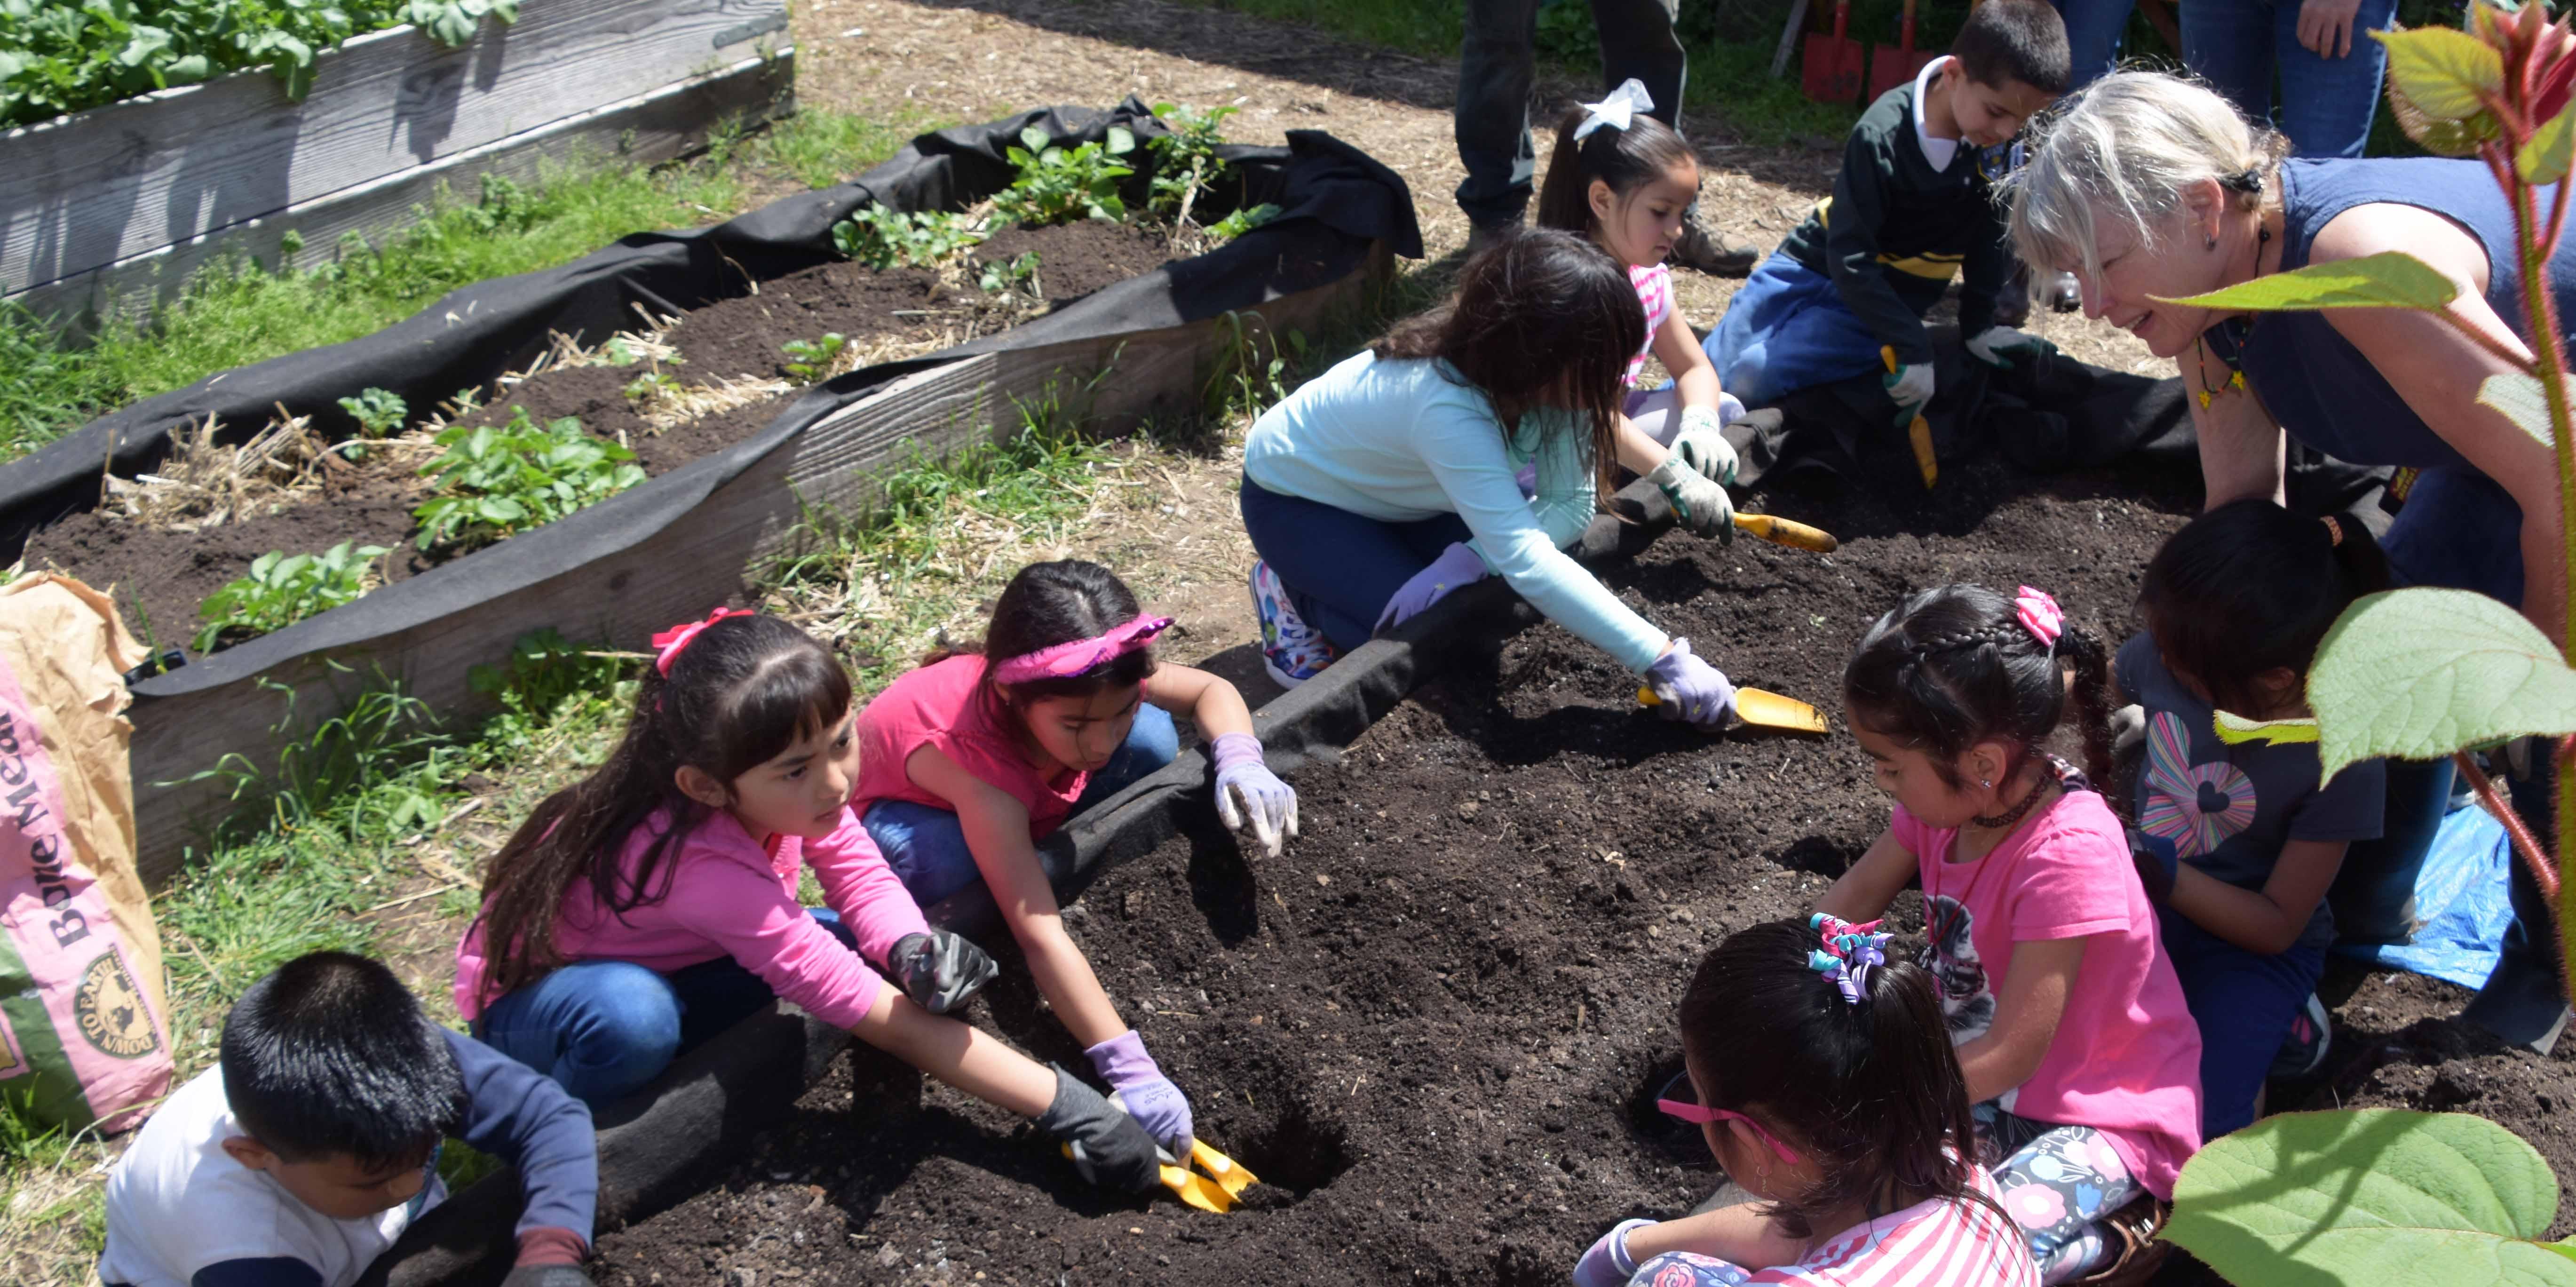 Steele Lane students preparing bed in Vicki's Garden